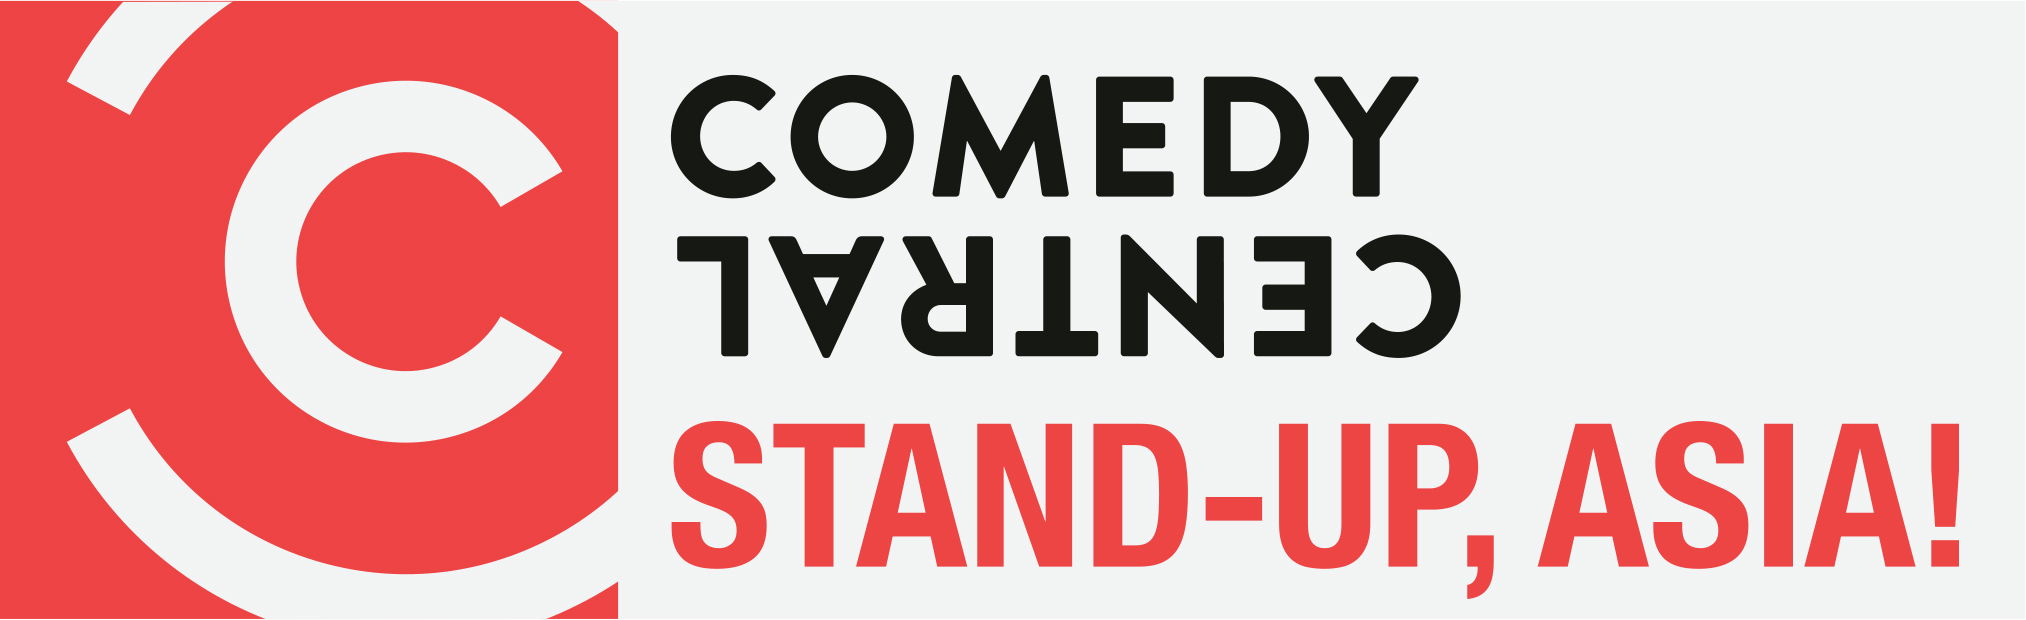 218427 comedy%20central%20presents%20stand up,%20asia!%20logo 15fcdc original 1468896396